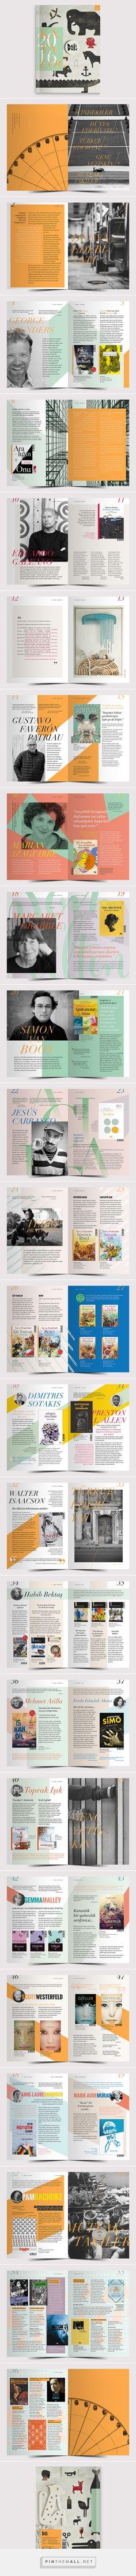 Delidolu Yayın Kataloğu 2016 on Behance, designed by Burak Tuna - created via http://pinthemall.net